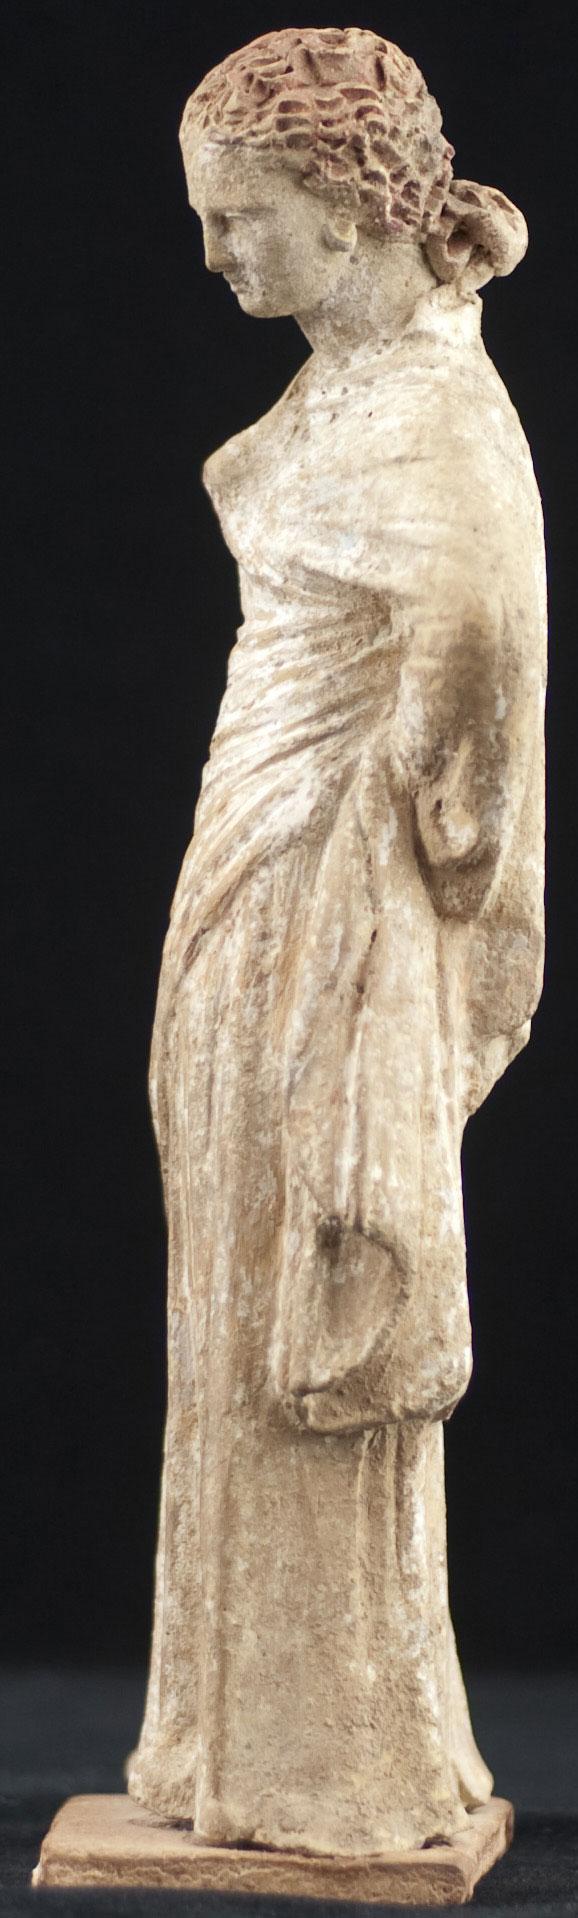 Tanagra Figure (354031)